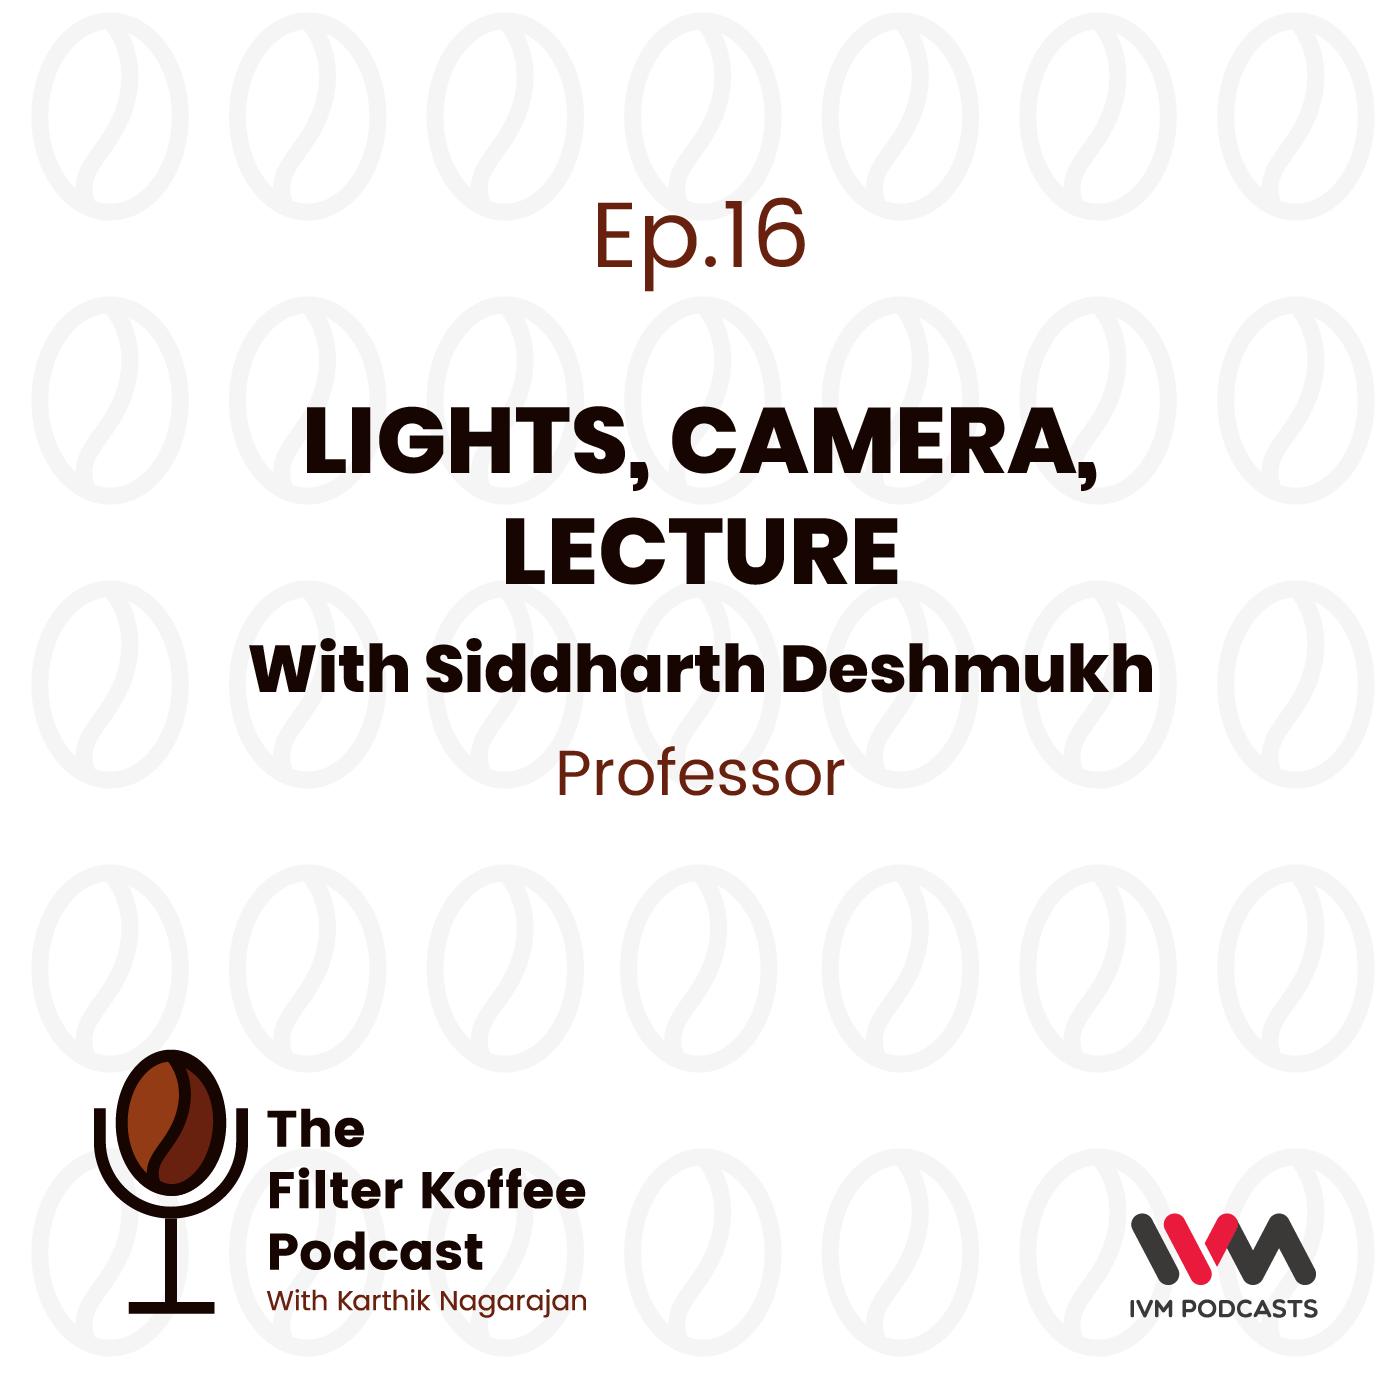 Ep. 16: Lights, Camera, Lecture with Siddharth Deshmukh